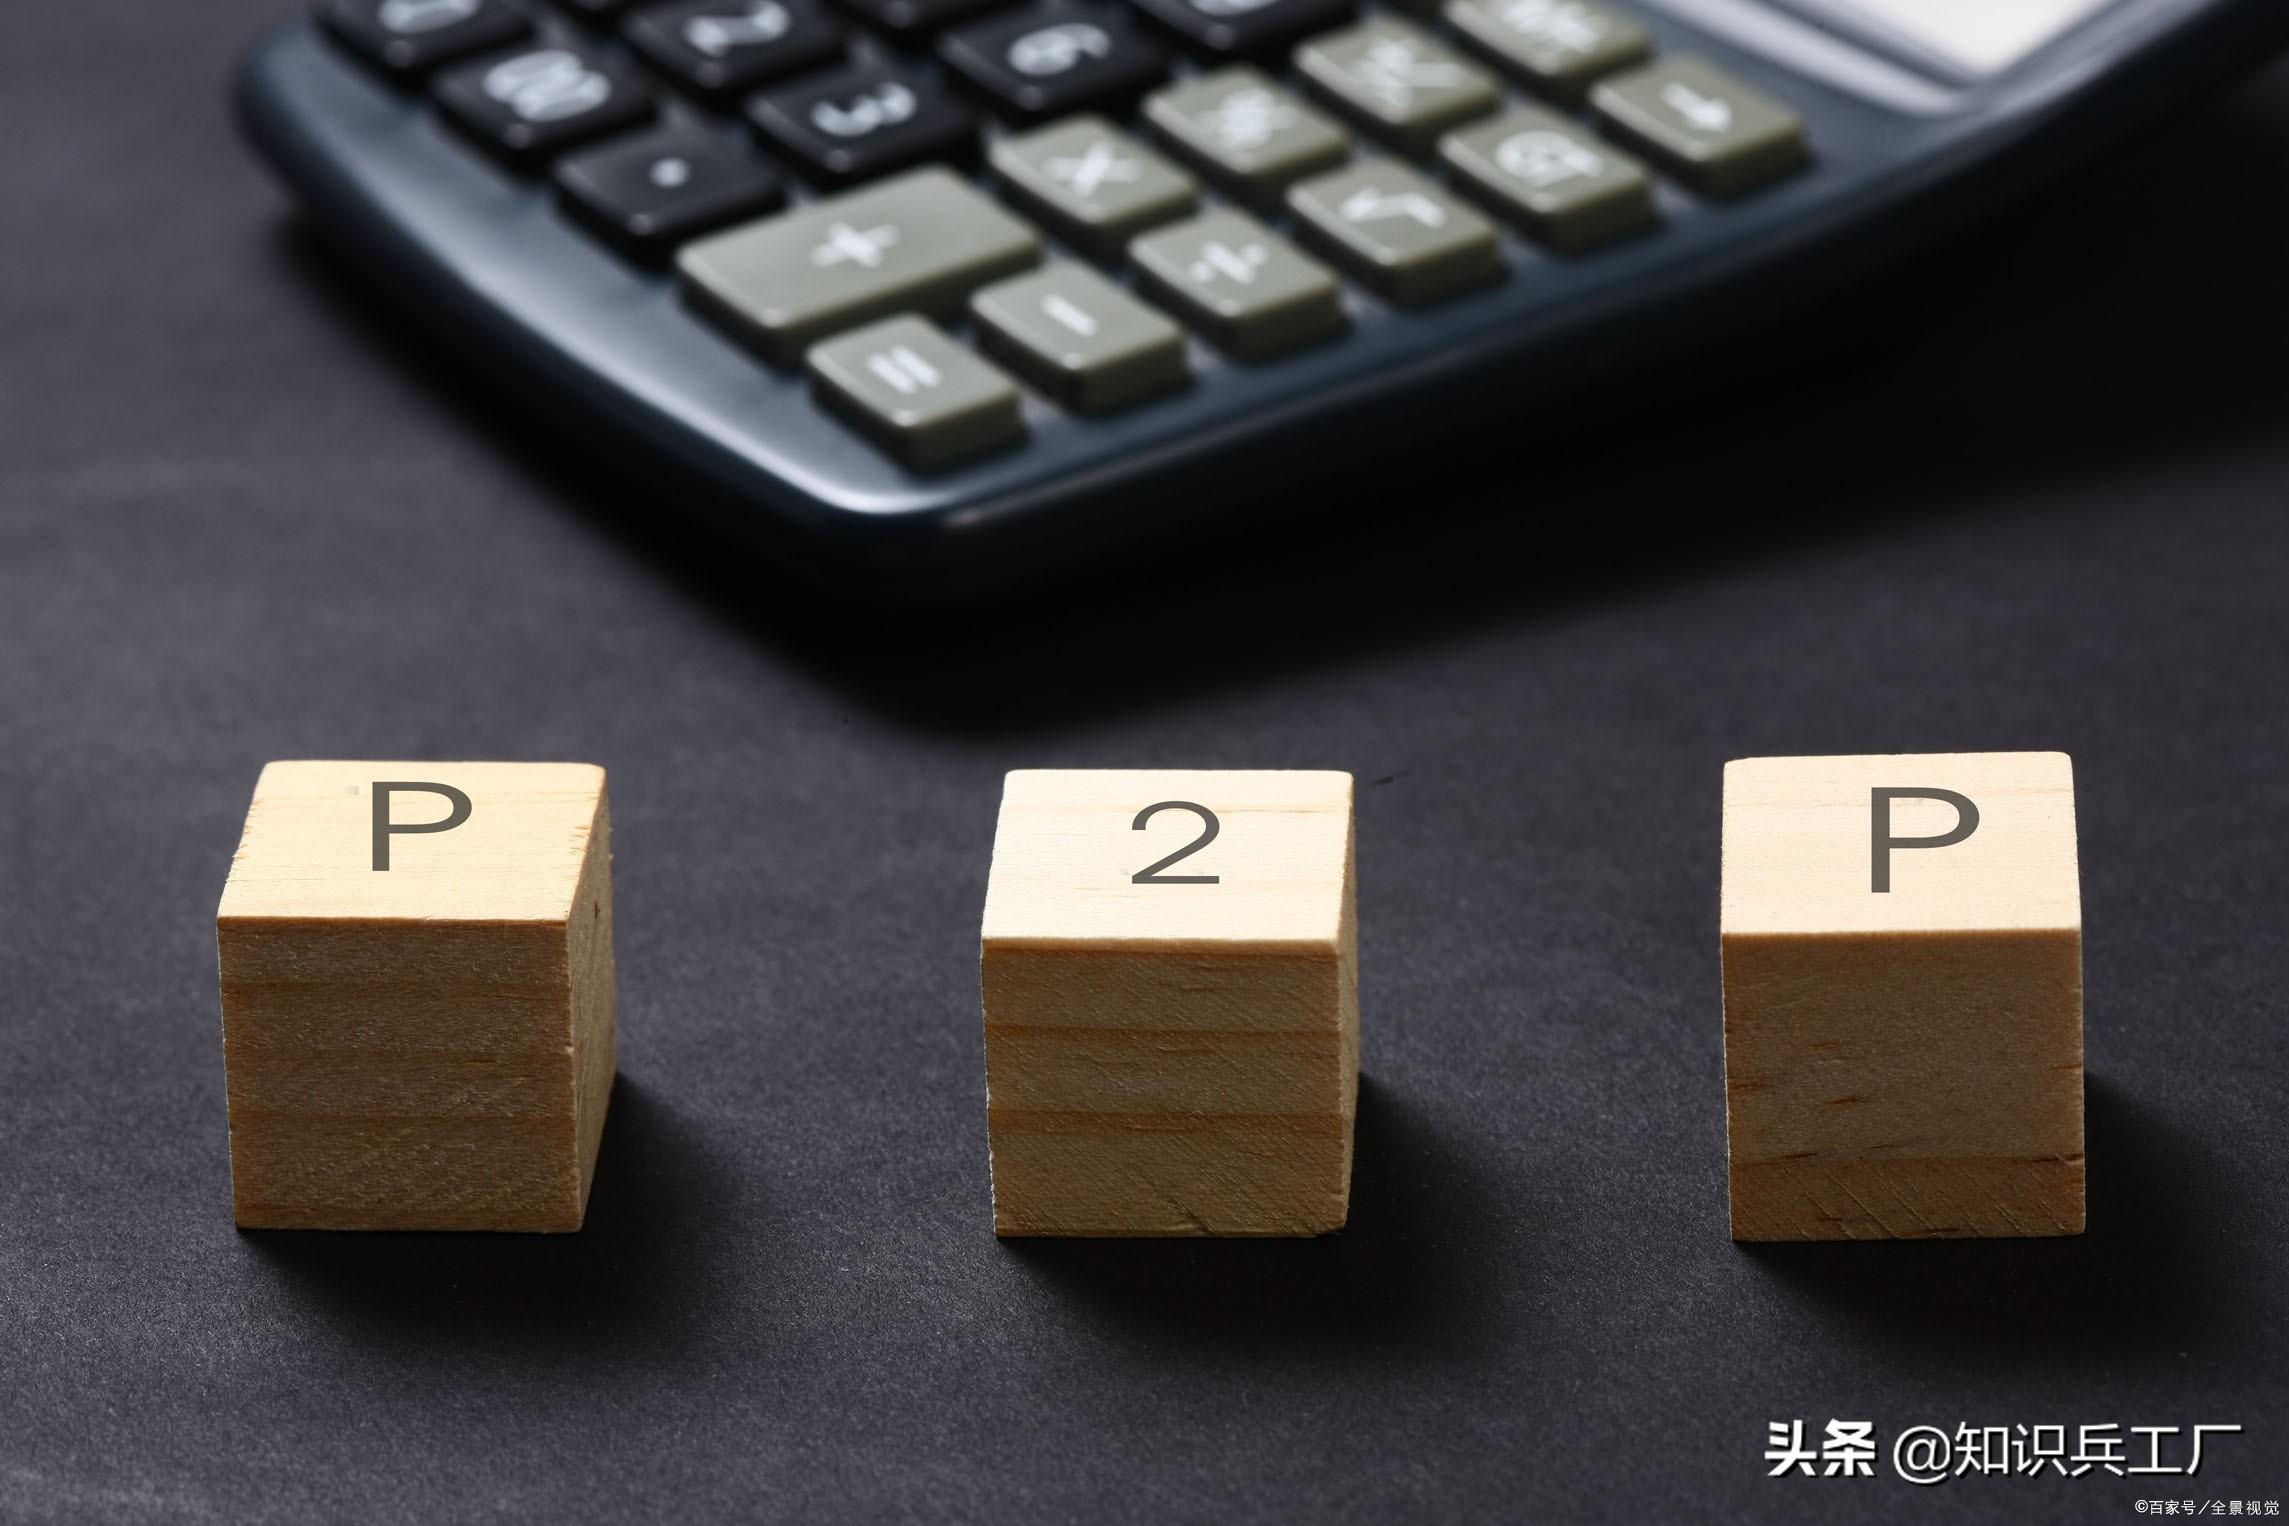 P2P平台降到只剩3家,清退工作已经接近终点